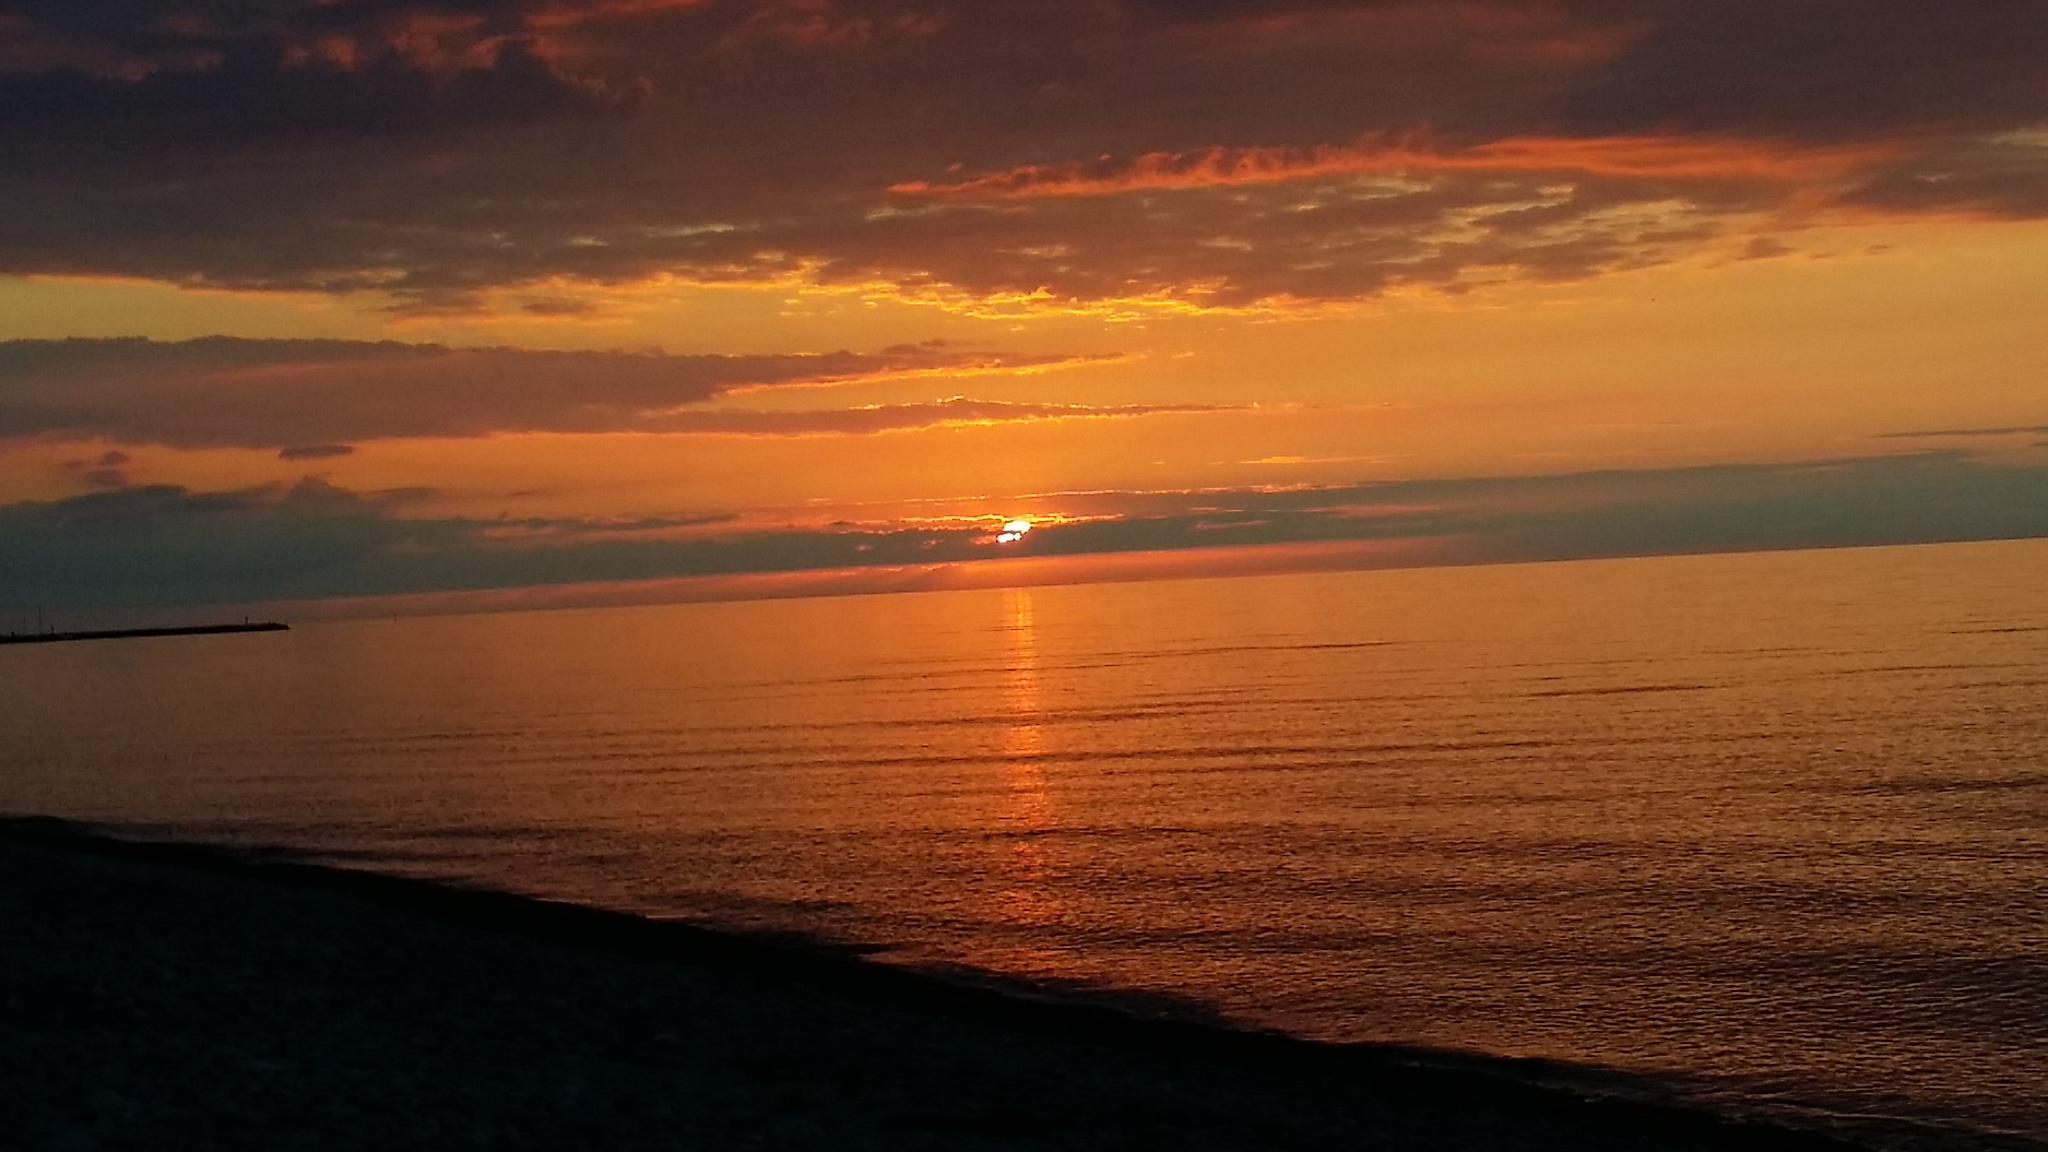 Sonnenuntergang am Sanddornstrand